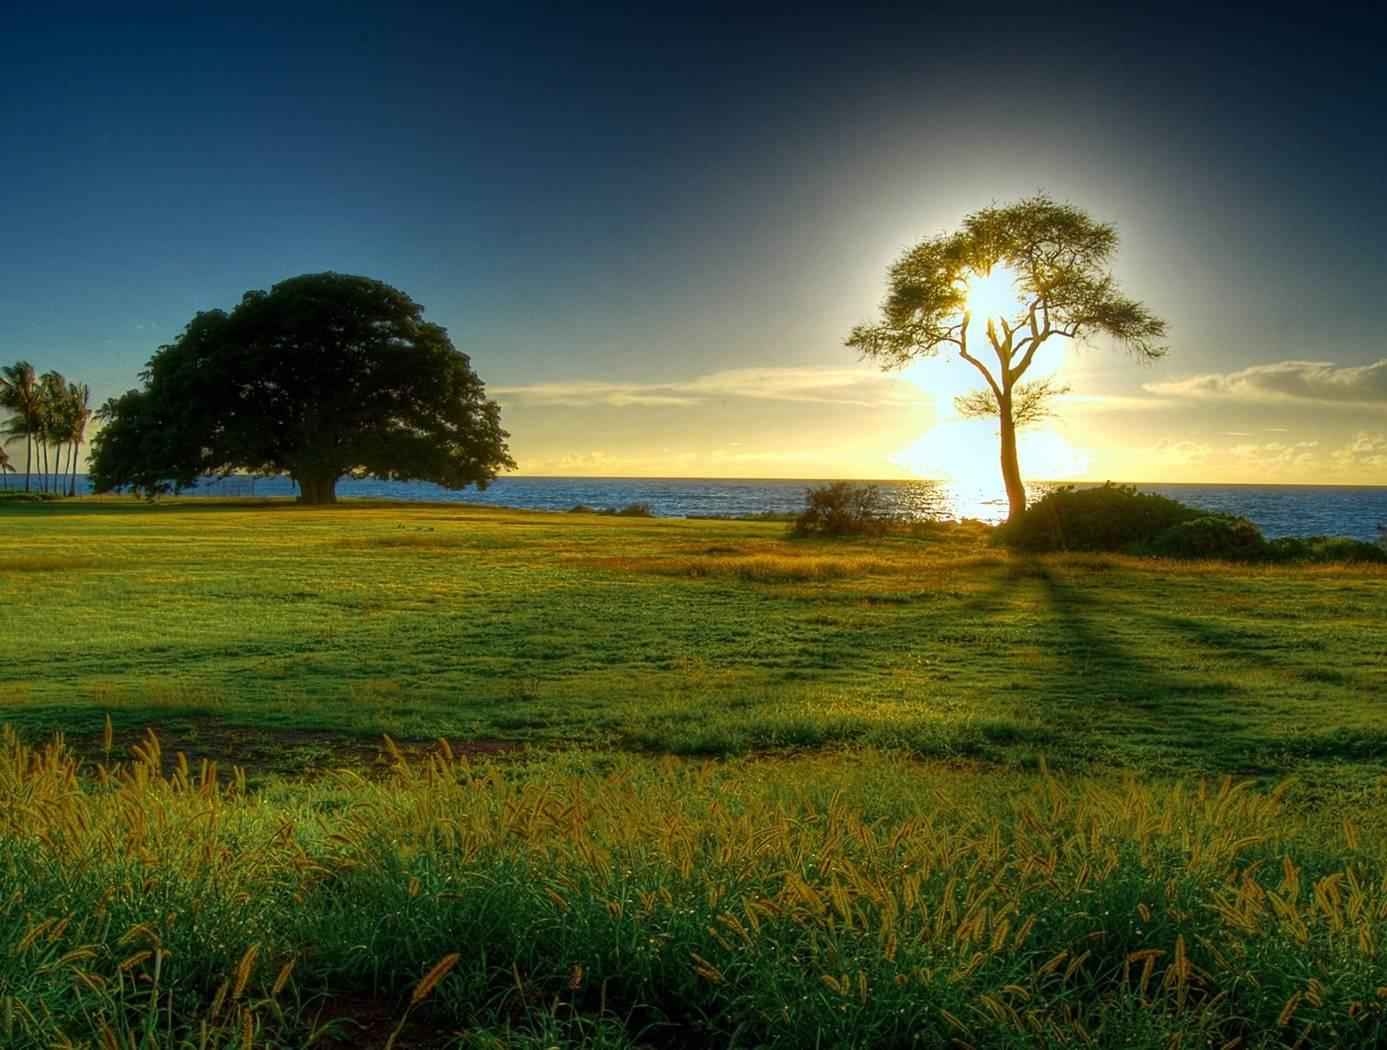 Trees-landscape